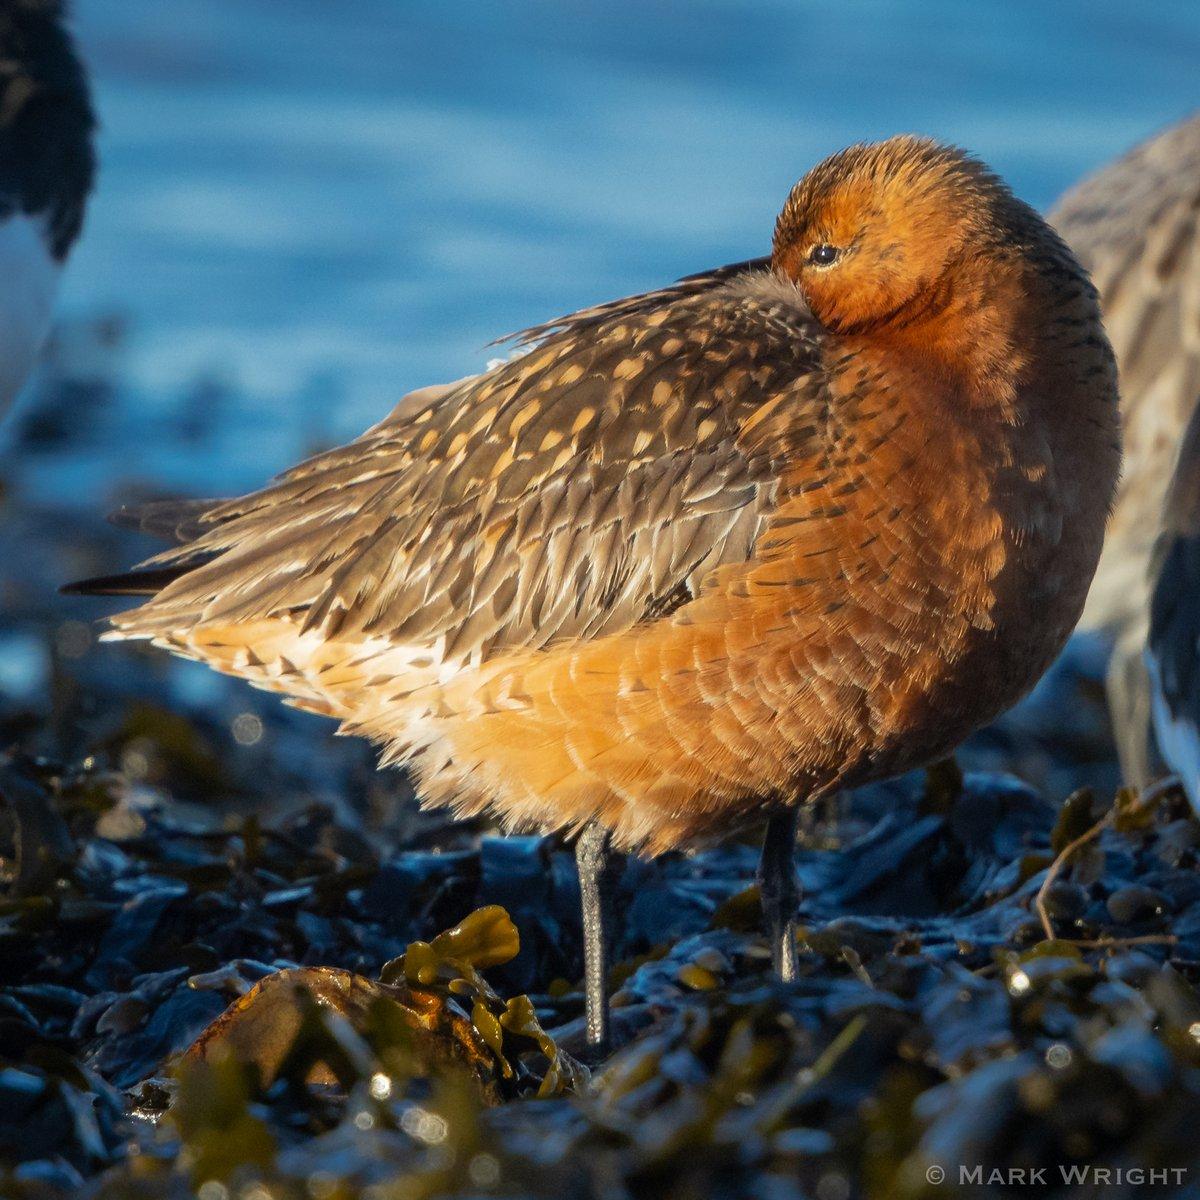 """Old Red"" (Bar-tailed Godwit) and an Oystercatcher Sandbanks, Poole Harbour, Dorset @harbourbirds @DorsetWildlife<br>http://pic.twitter.com/38sDzMJFws"